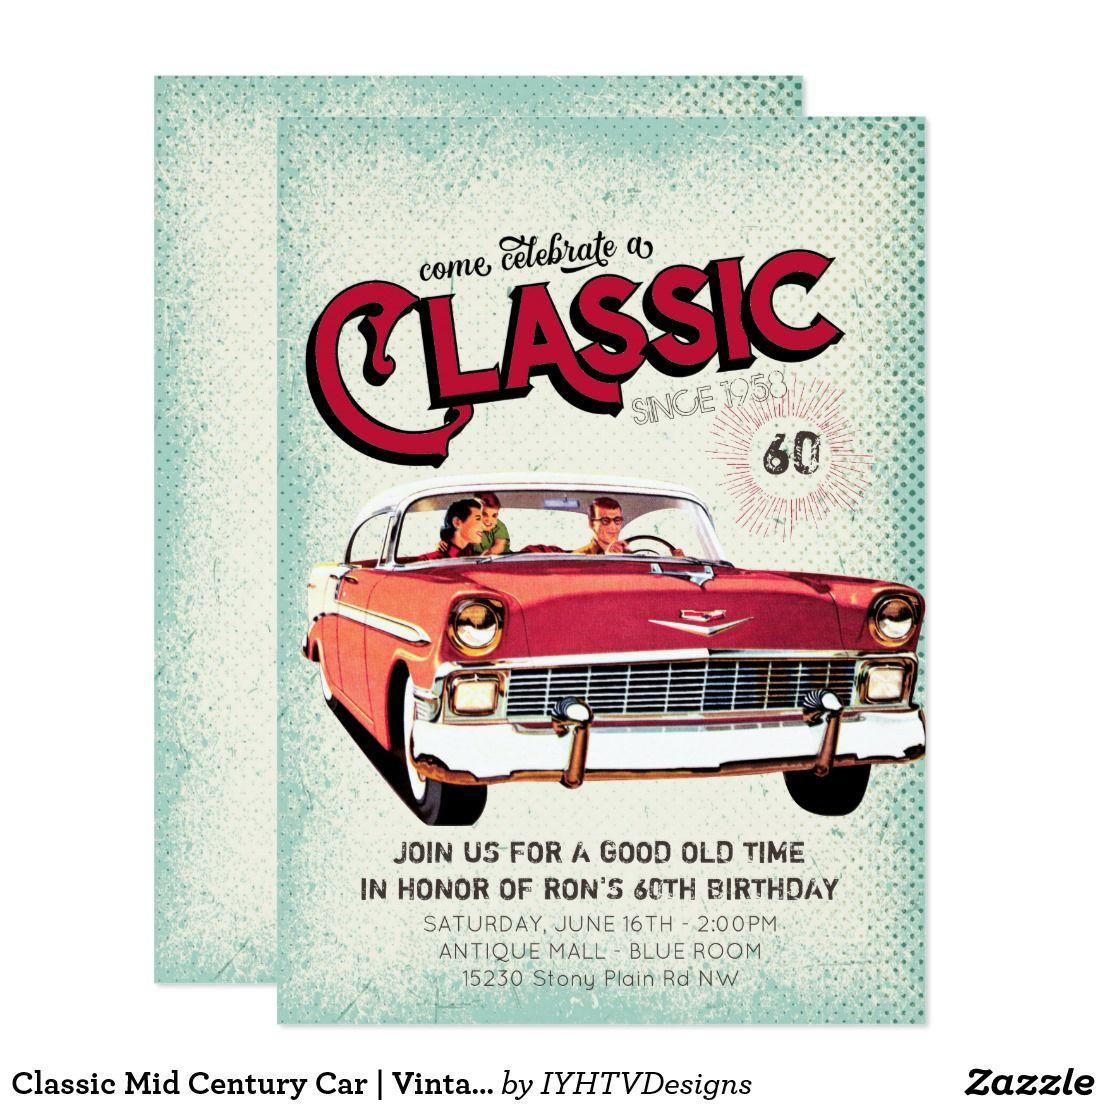 Classic Mid Century Car | Vintage 60th Birthday Invitation | Zazzle.com